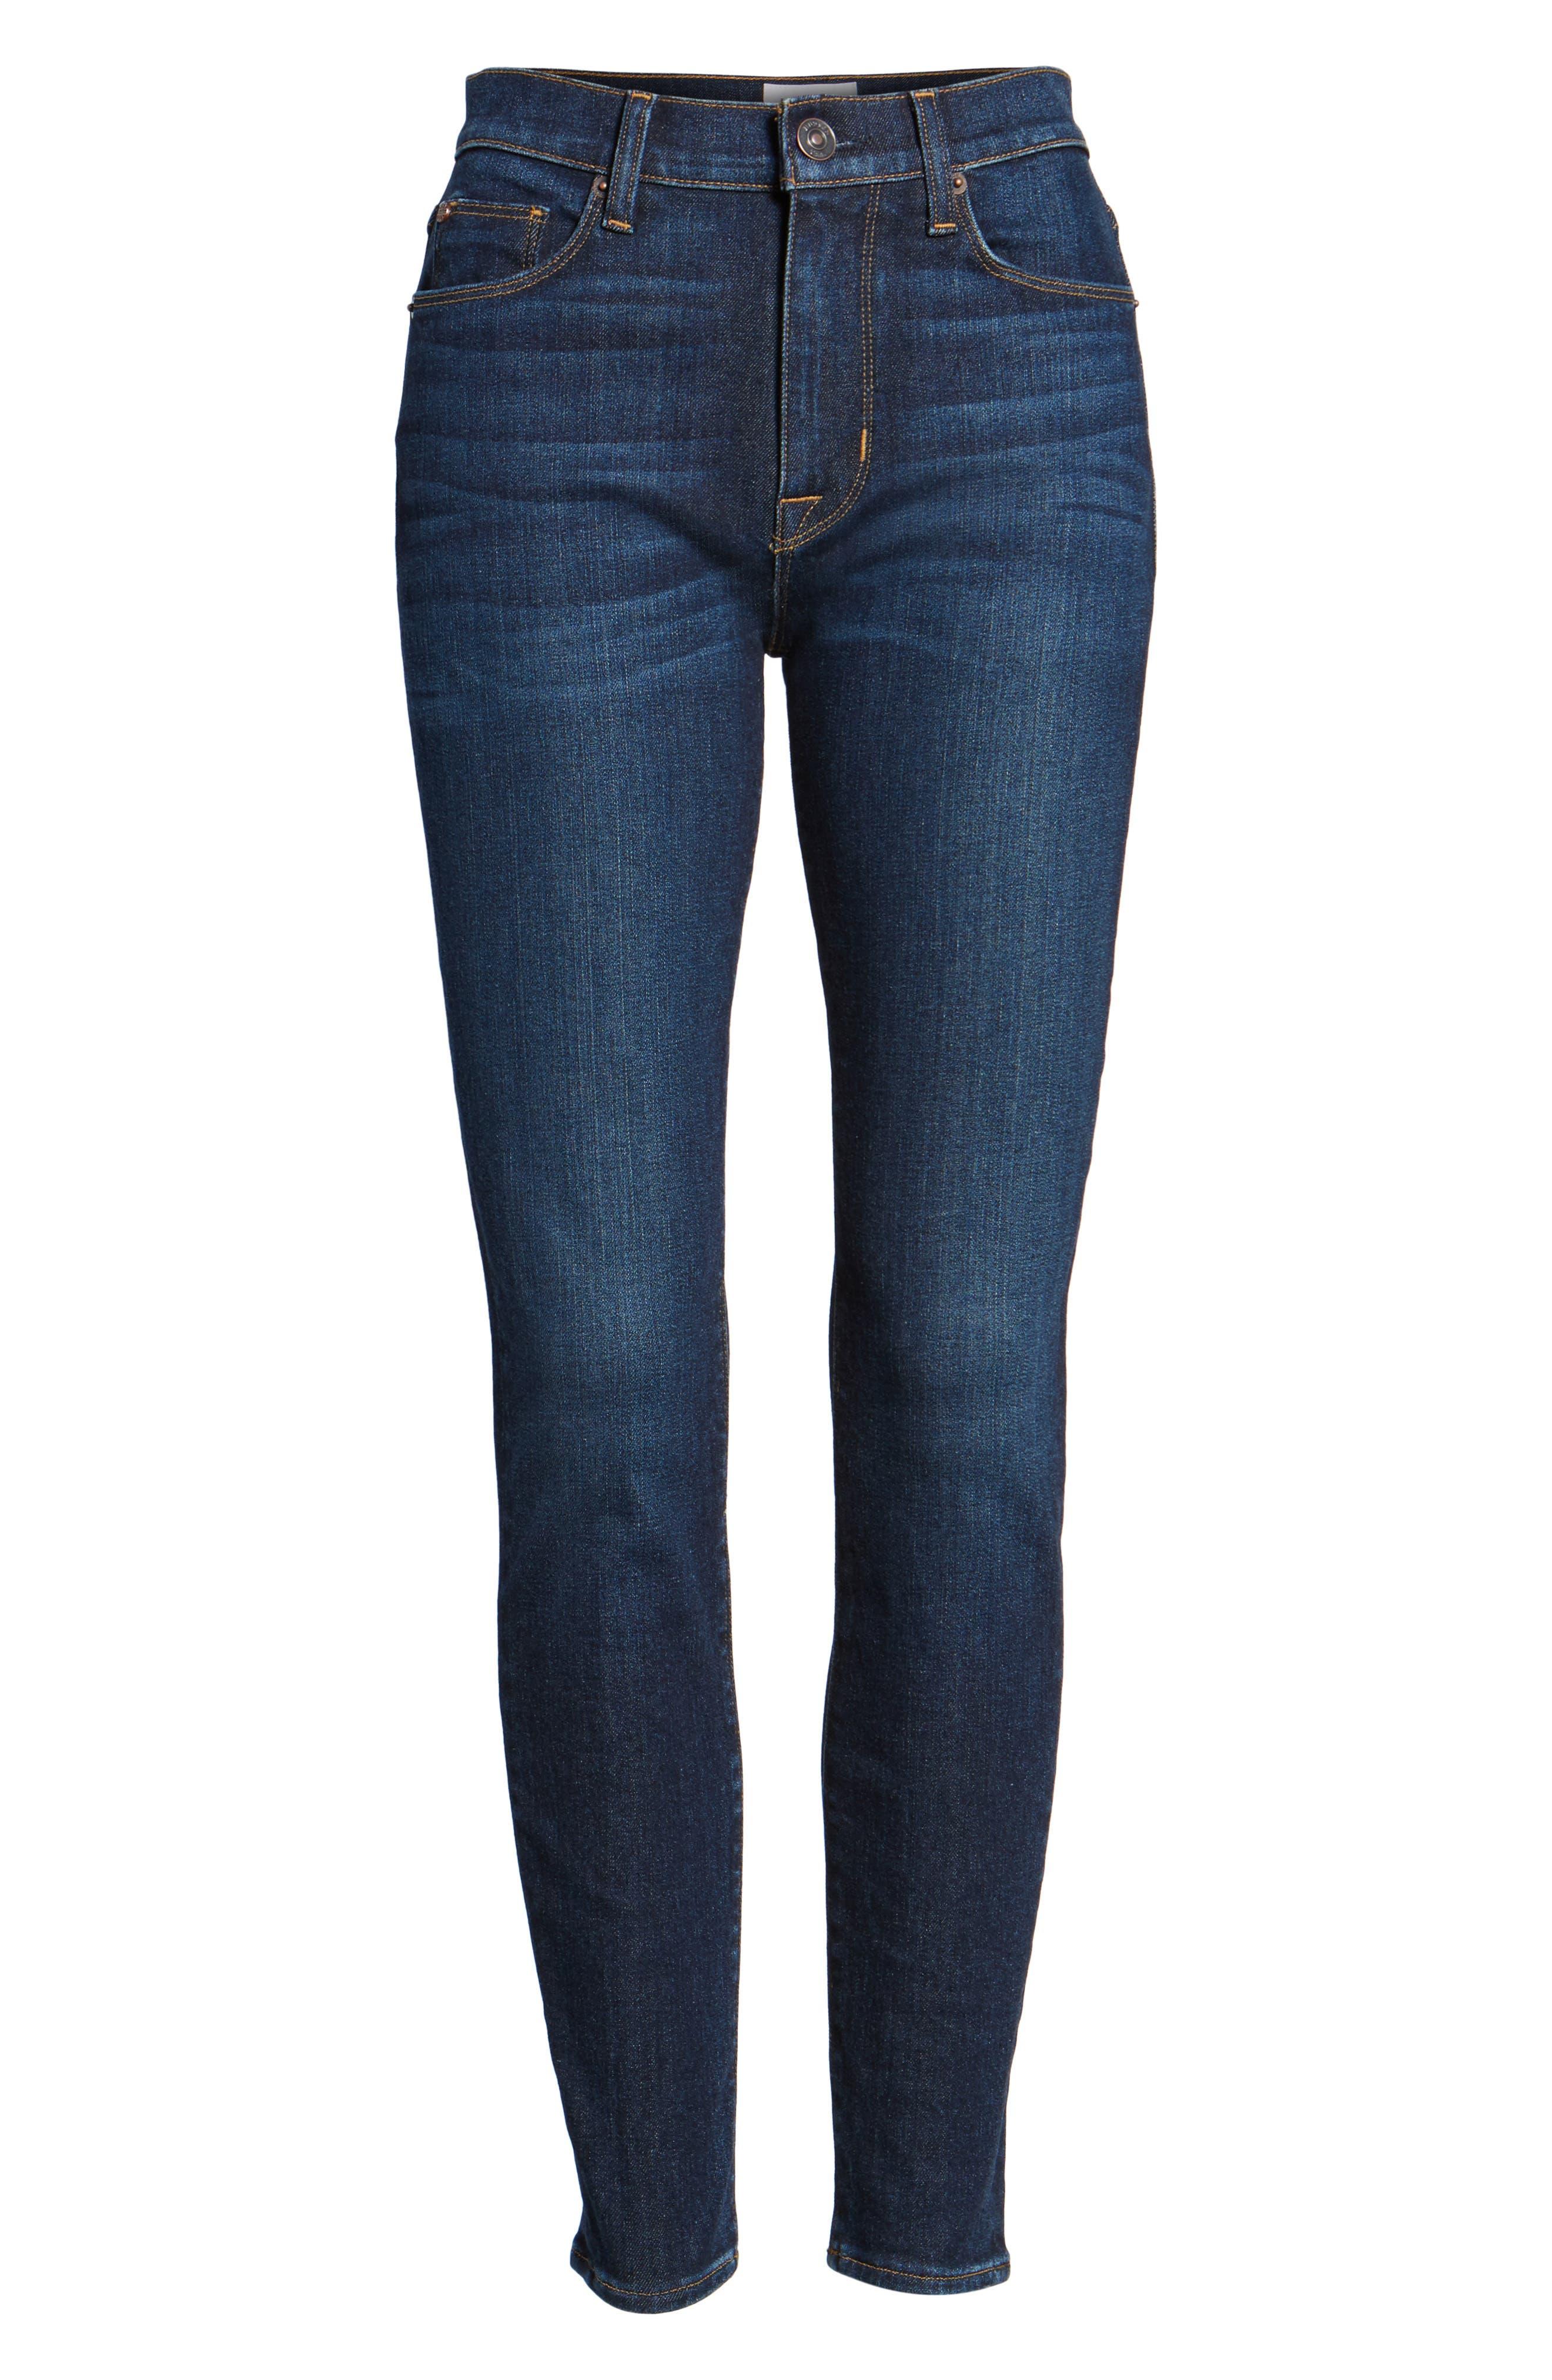 Barbara High Waist Ankle Super Skinny Jeans,                             Alternate thumbnail 6, color,                             402